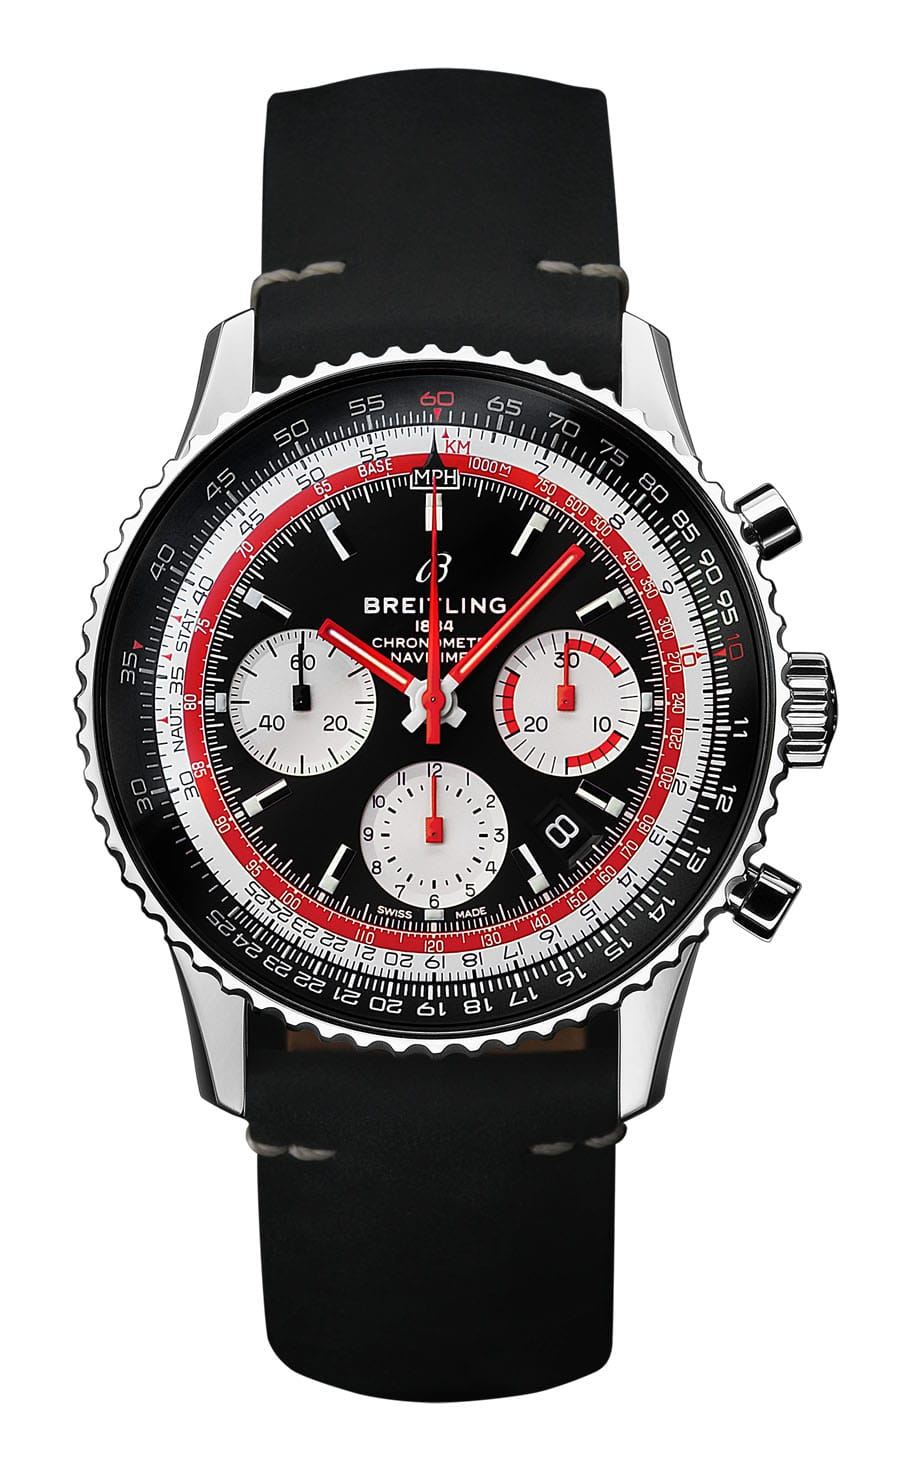 Breitling: Navitimer 1 B01 Chronograph 43 Swissair mit dem Manufakturkaliber B01